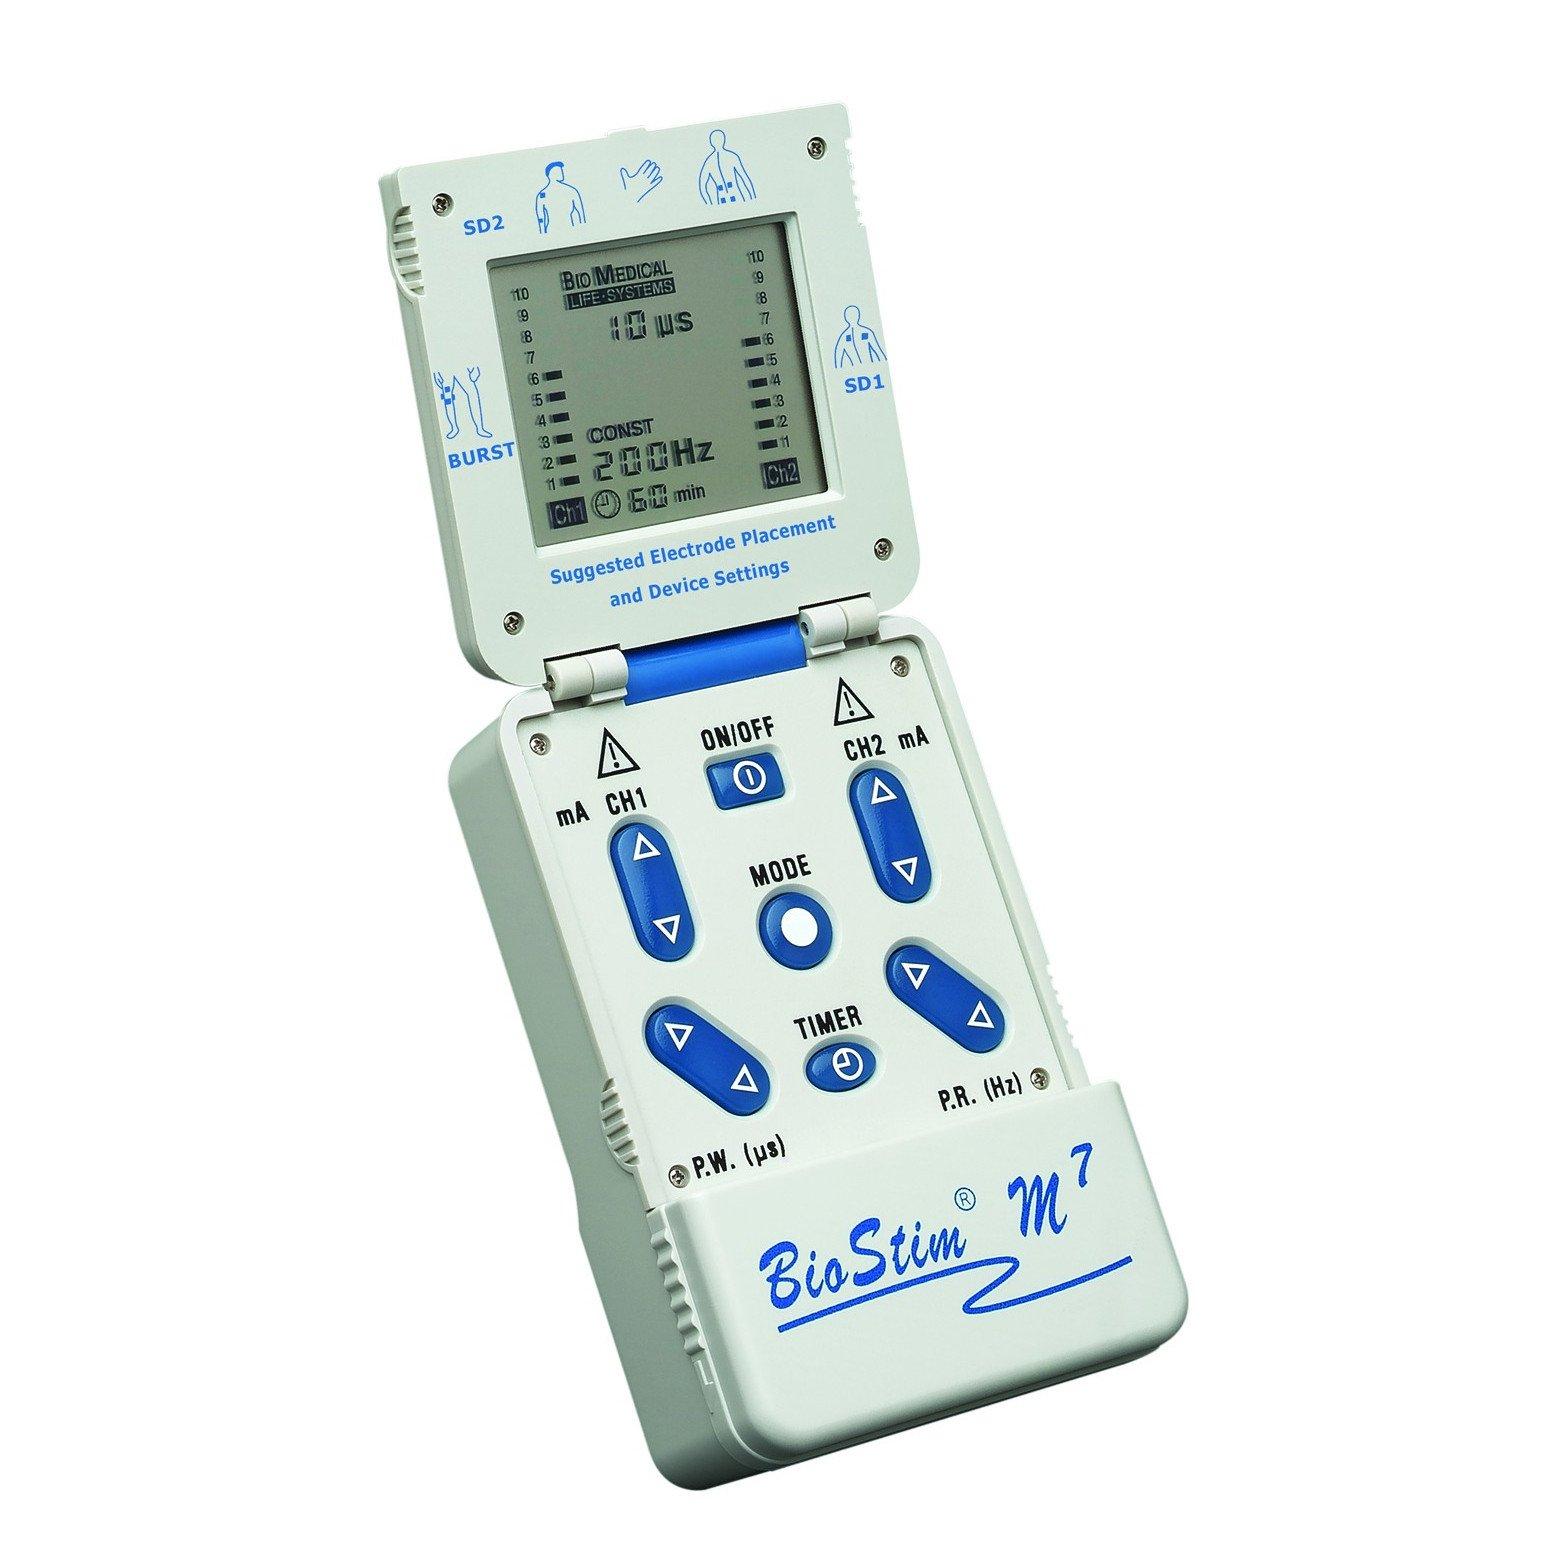 BioMedical Life Systems BioStim® M7